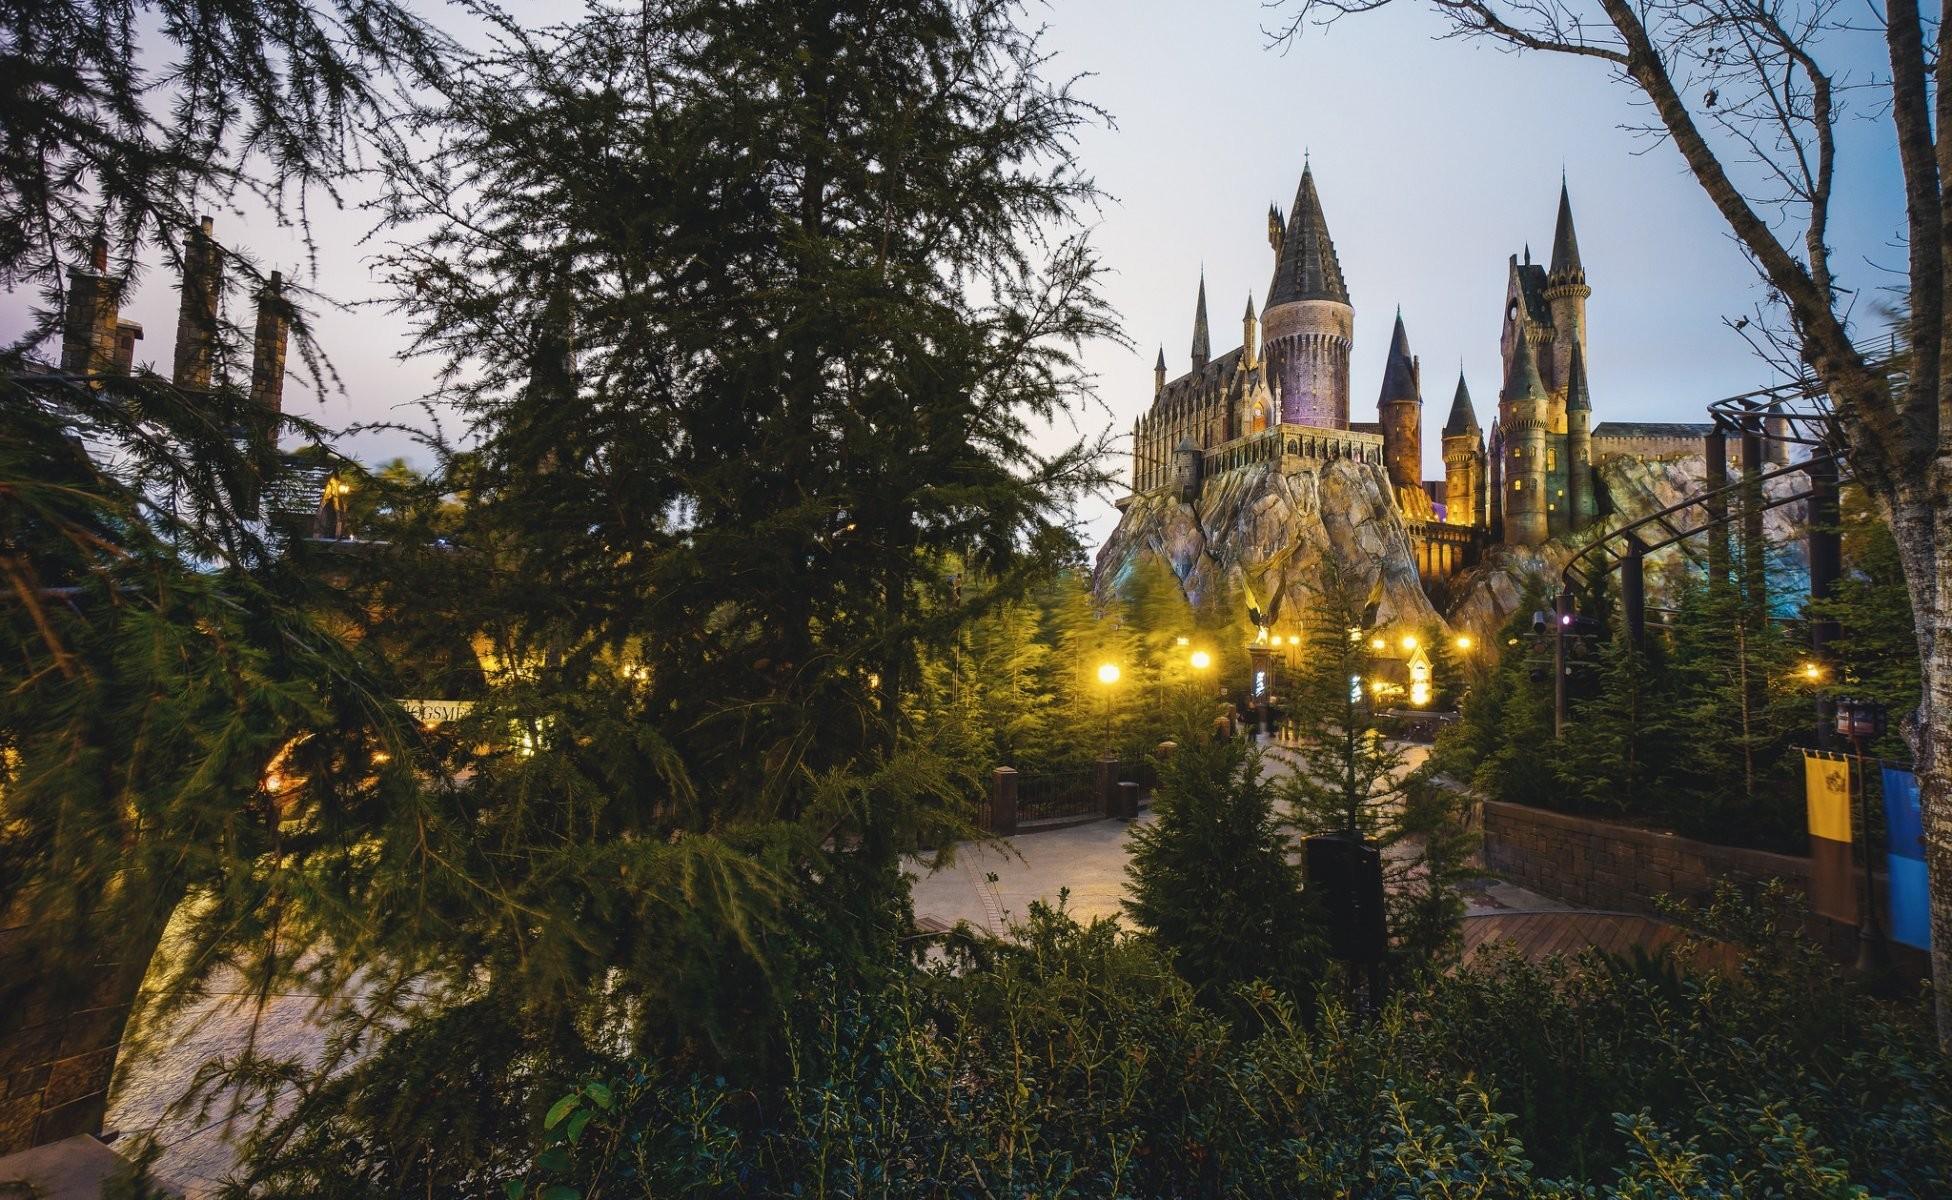 hogwarts wizarding world of harry potter tower castle